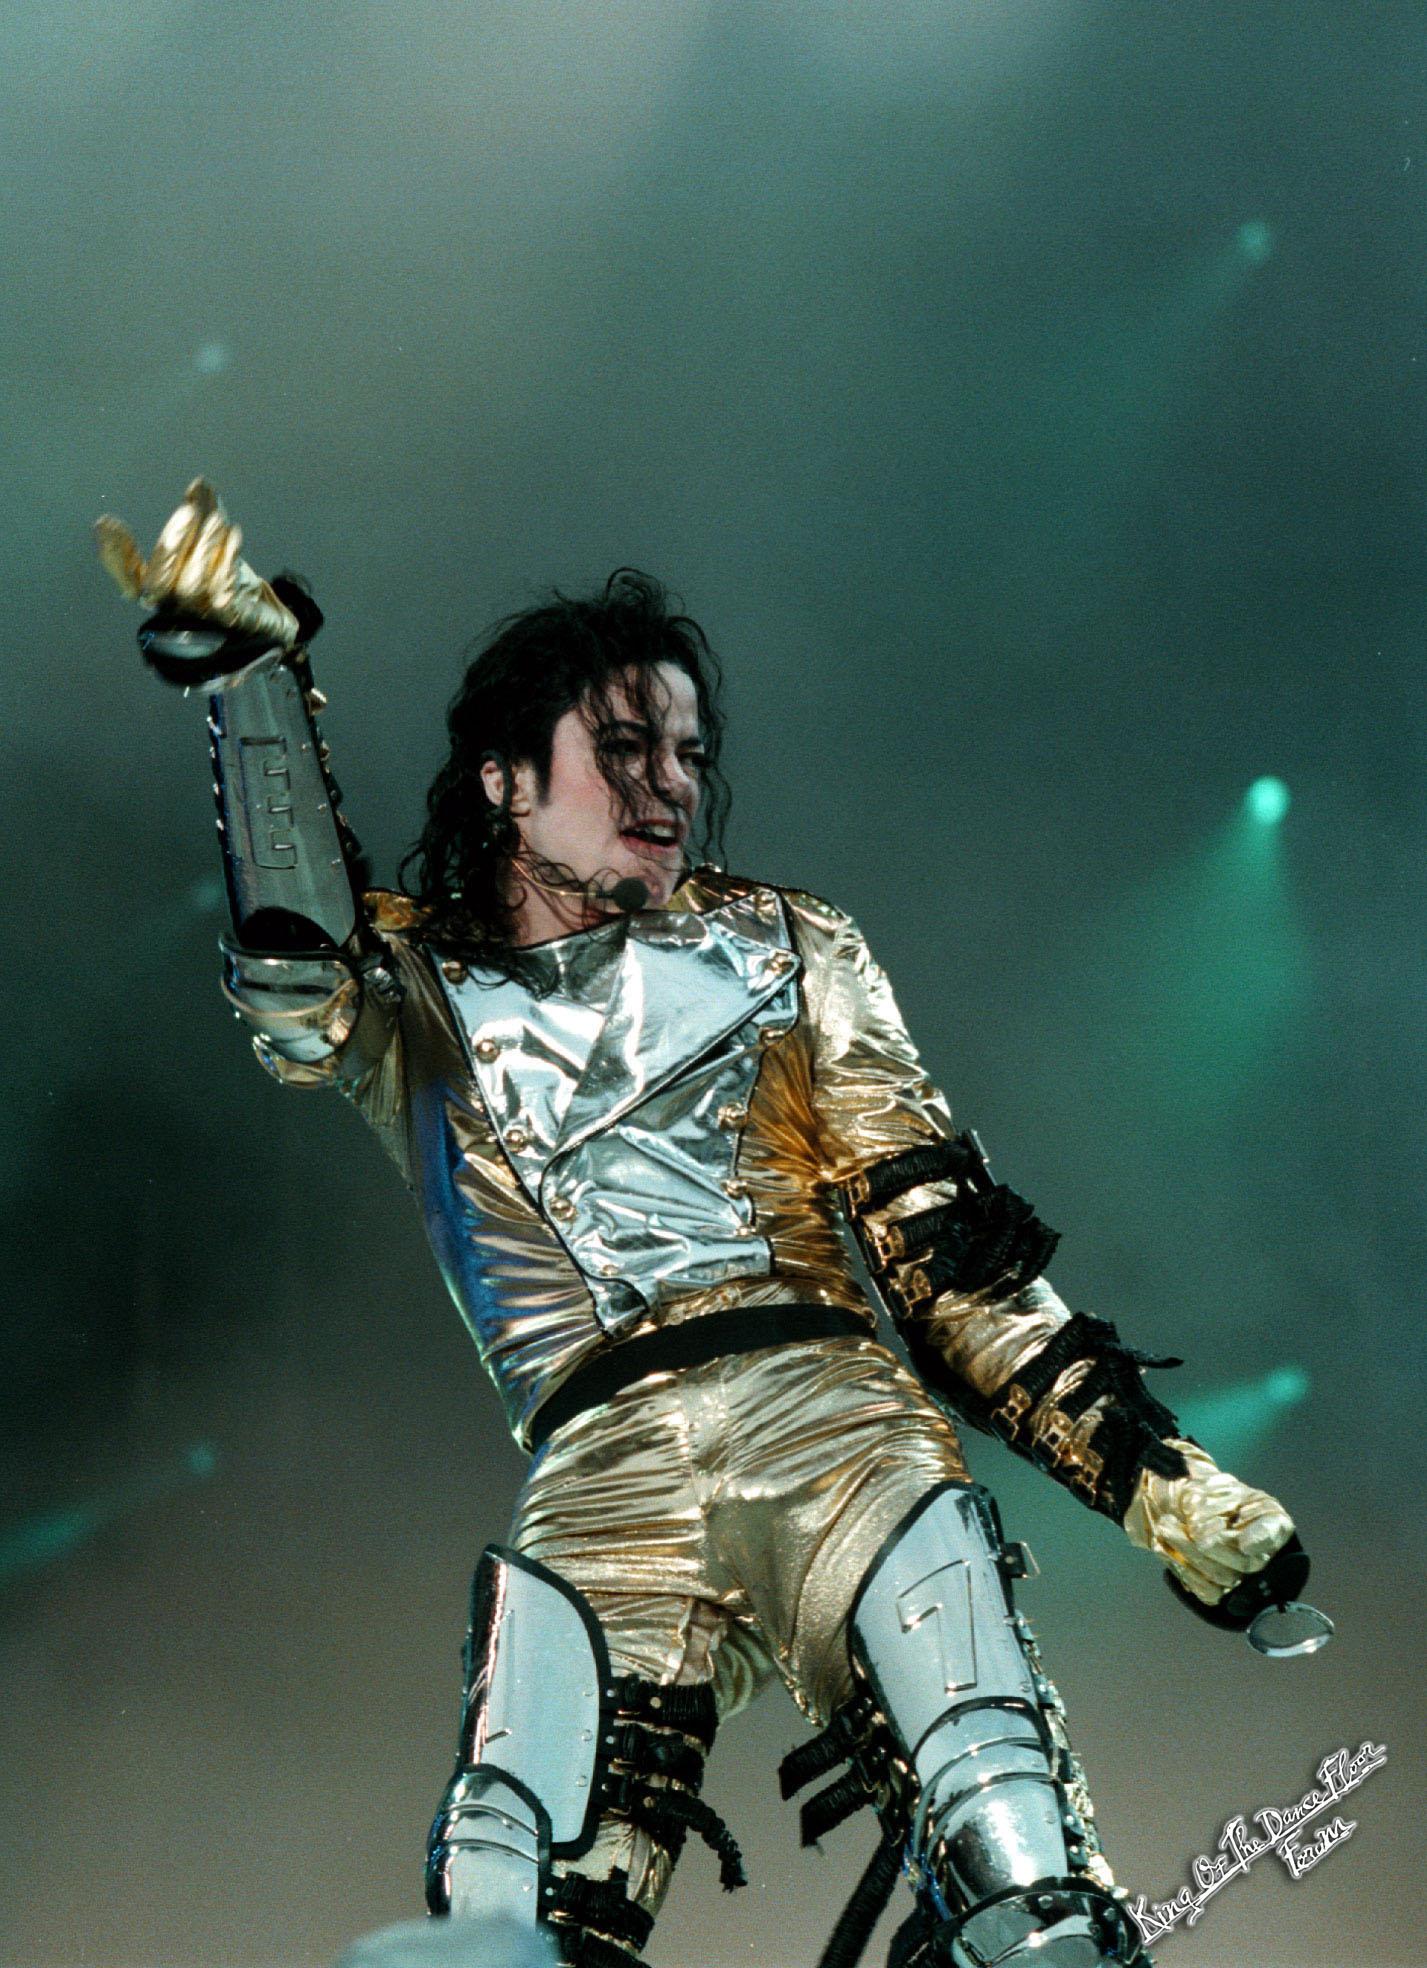 HISTORY TOUR  Michael-HIStory-tour-michael-jackson-29831211-1427-1968